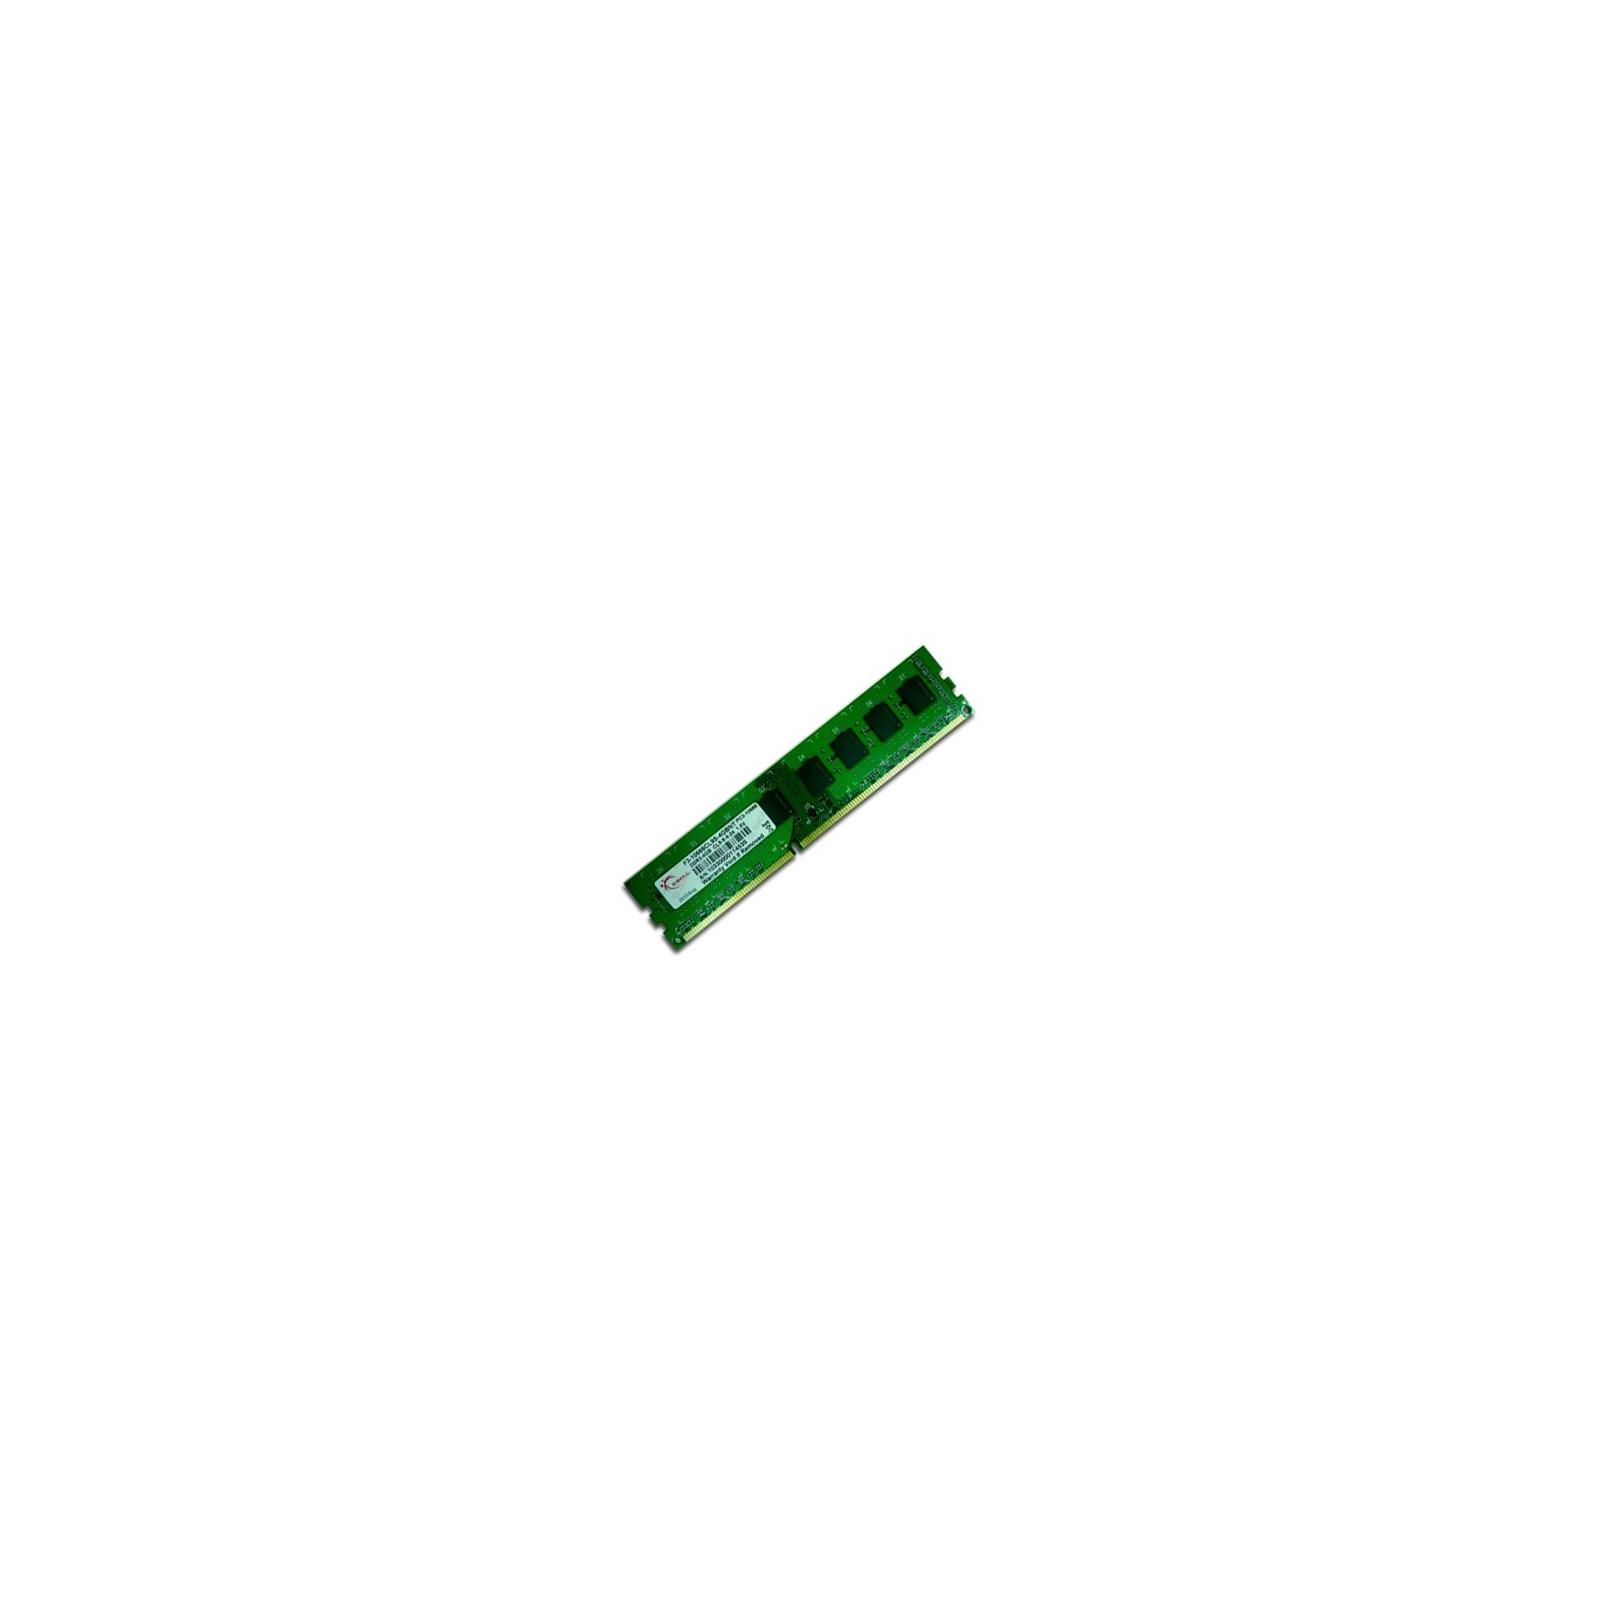 Модуль памяти для компьютера DDR3 4GB 1333 MHz G.Skill (F3-10600CL9S-4GBNT)